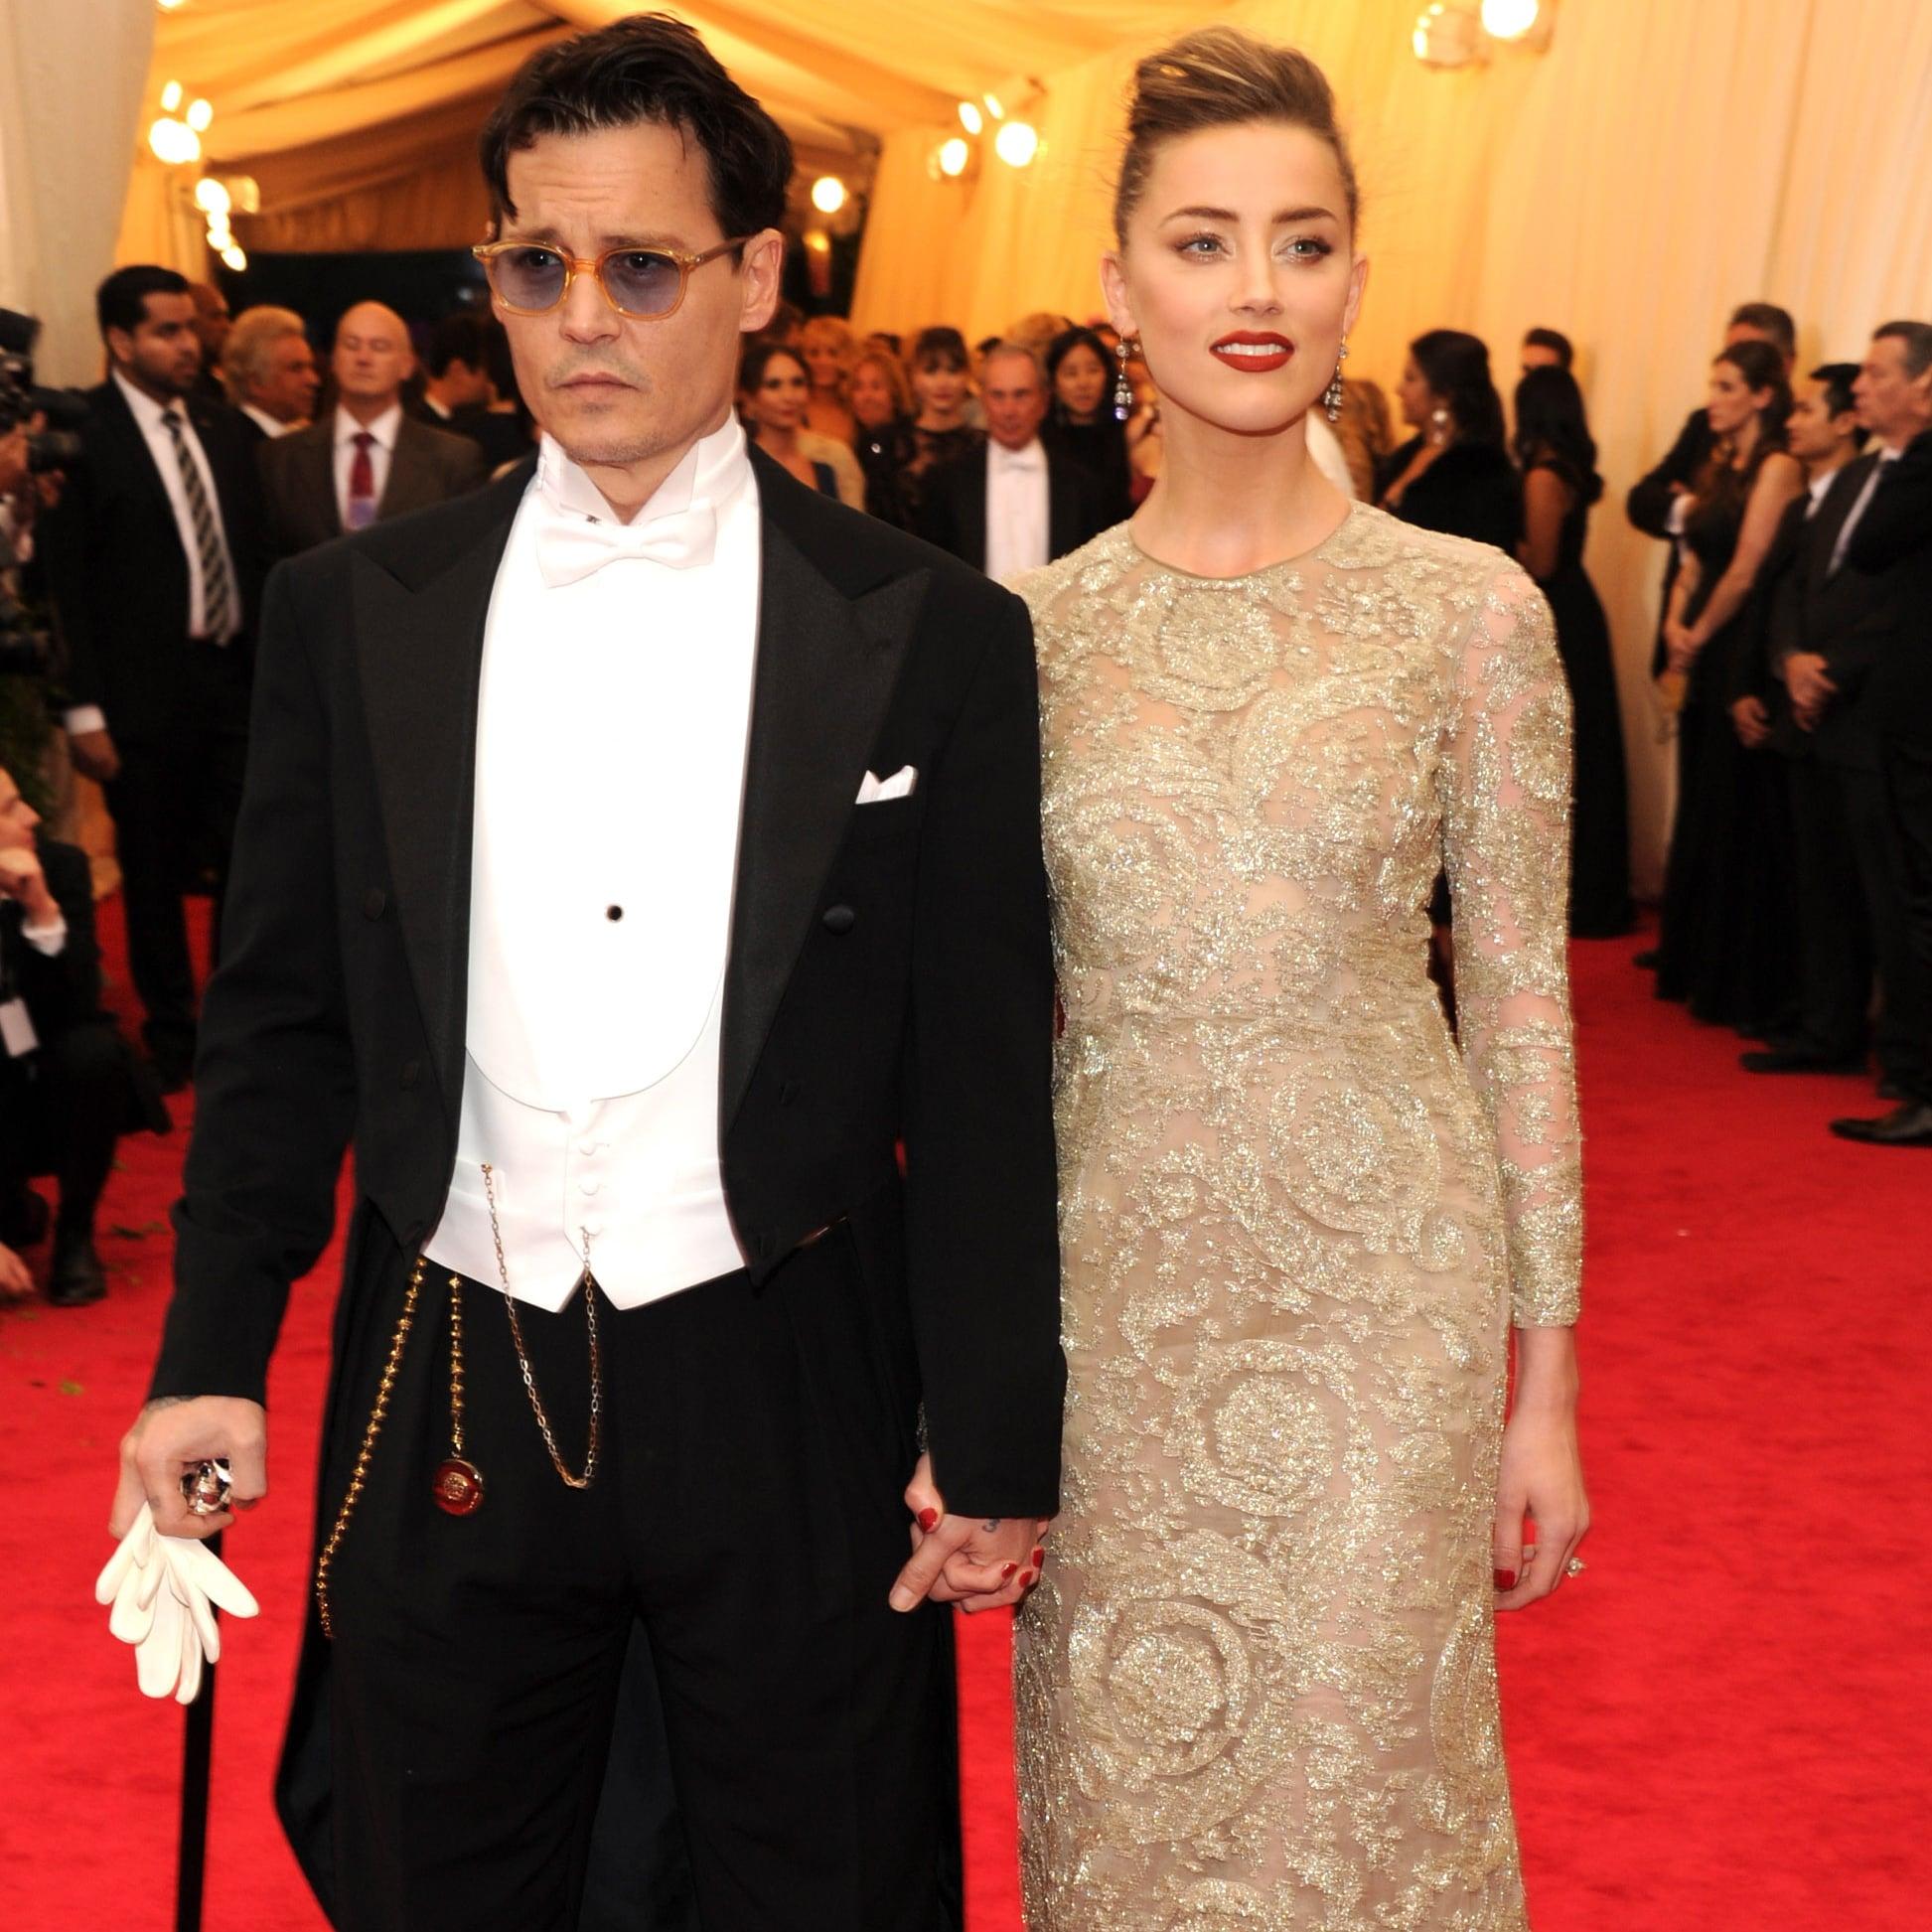 Johnny Depp and Amber Heard at the Met Gala 2014 | POPSUGAR Celebrity